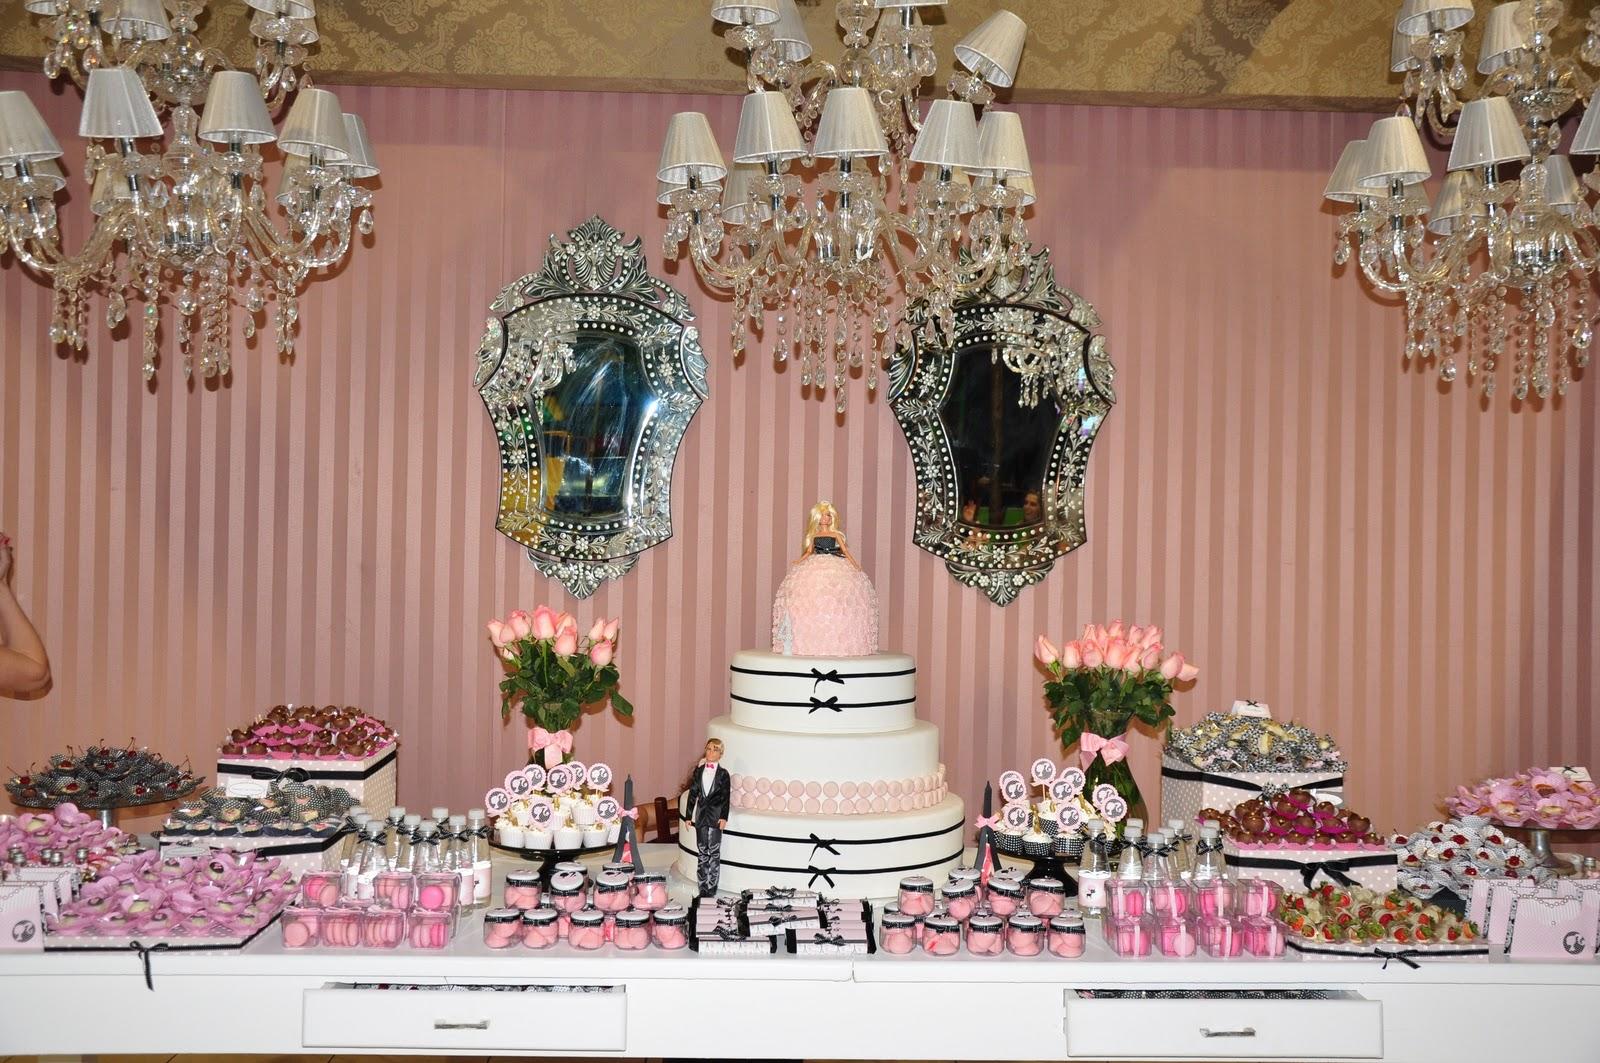 decoracao festa barbie : decoracao festa barbie:Festa Barbie Moda e Magia